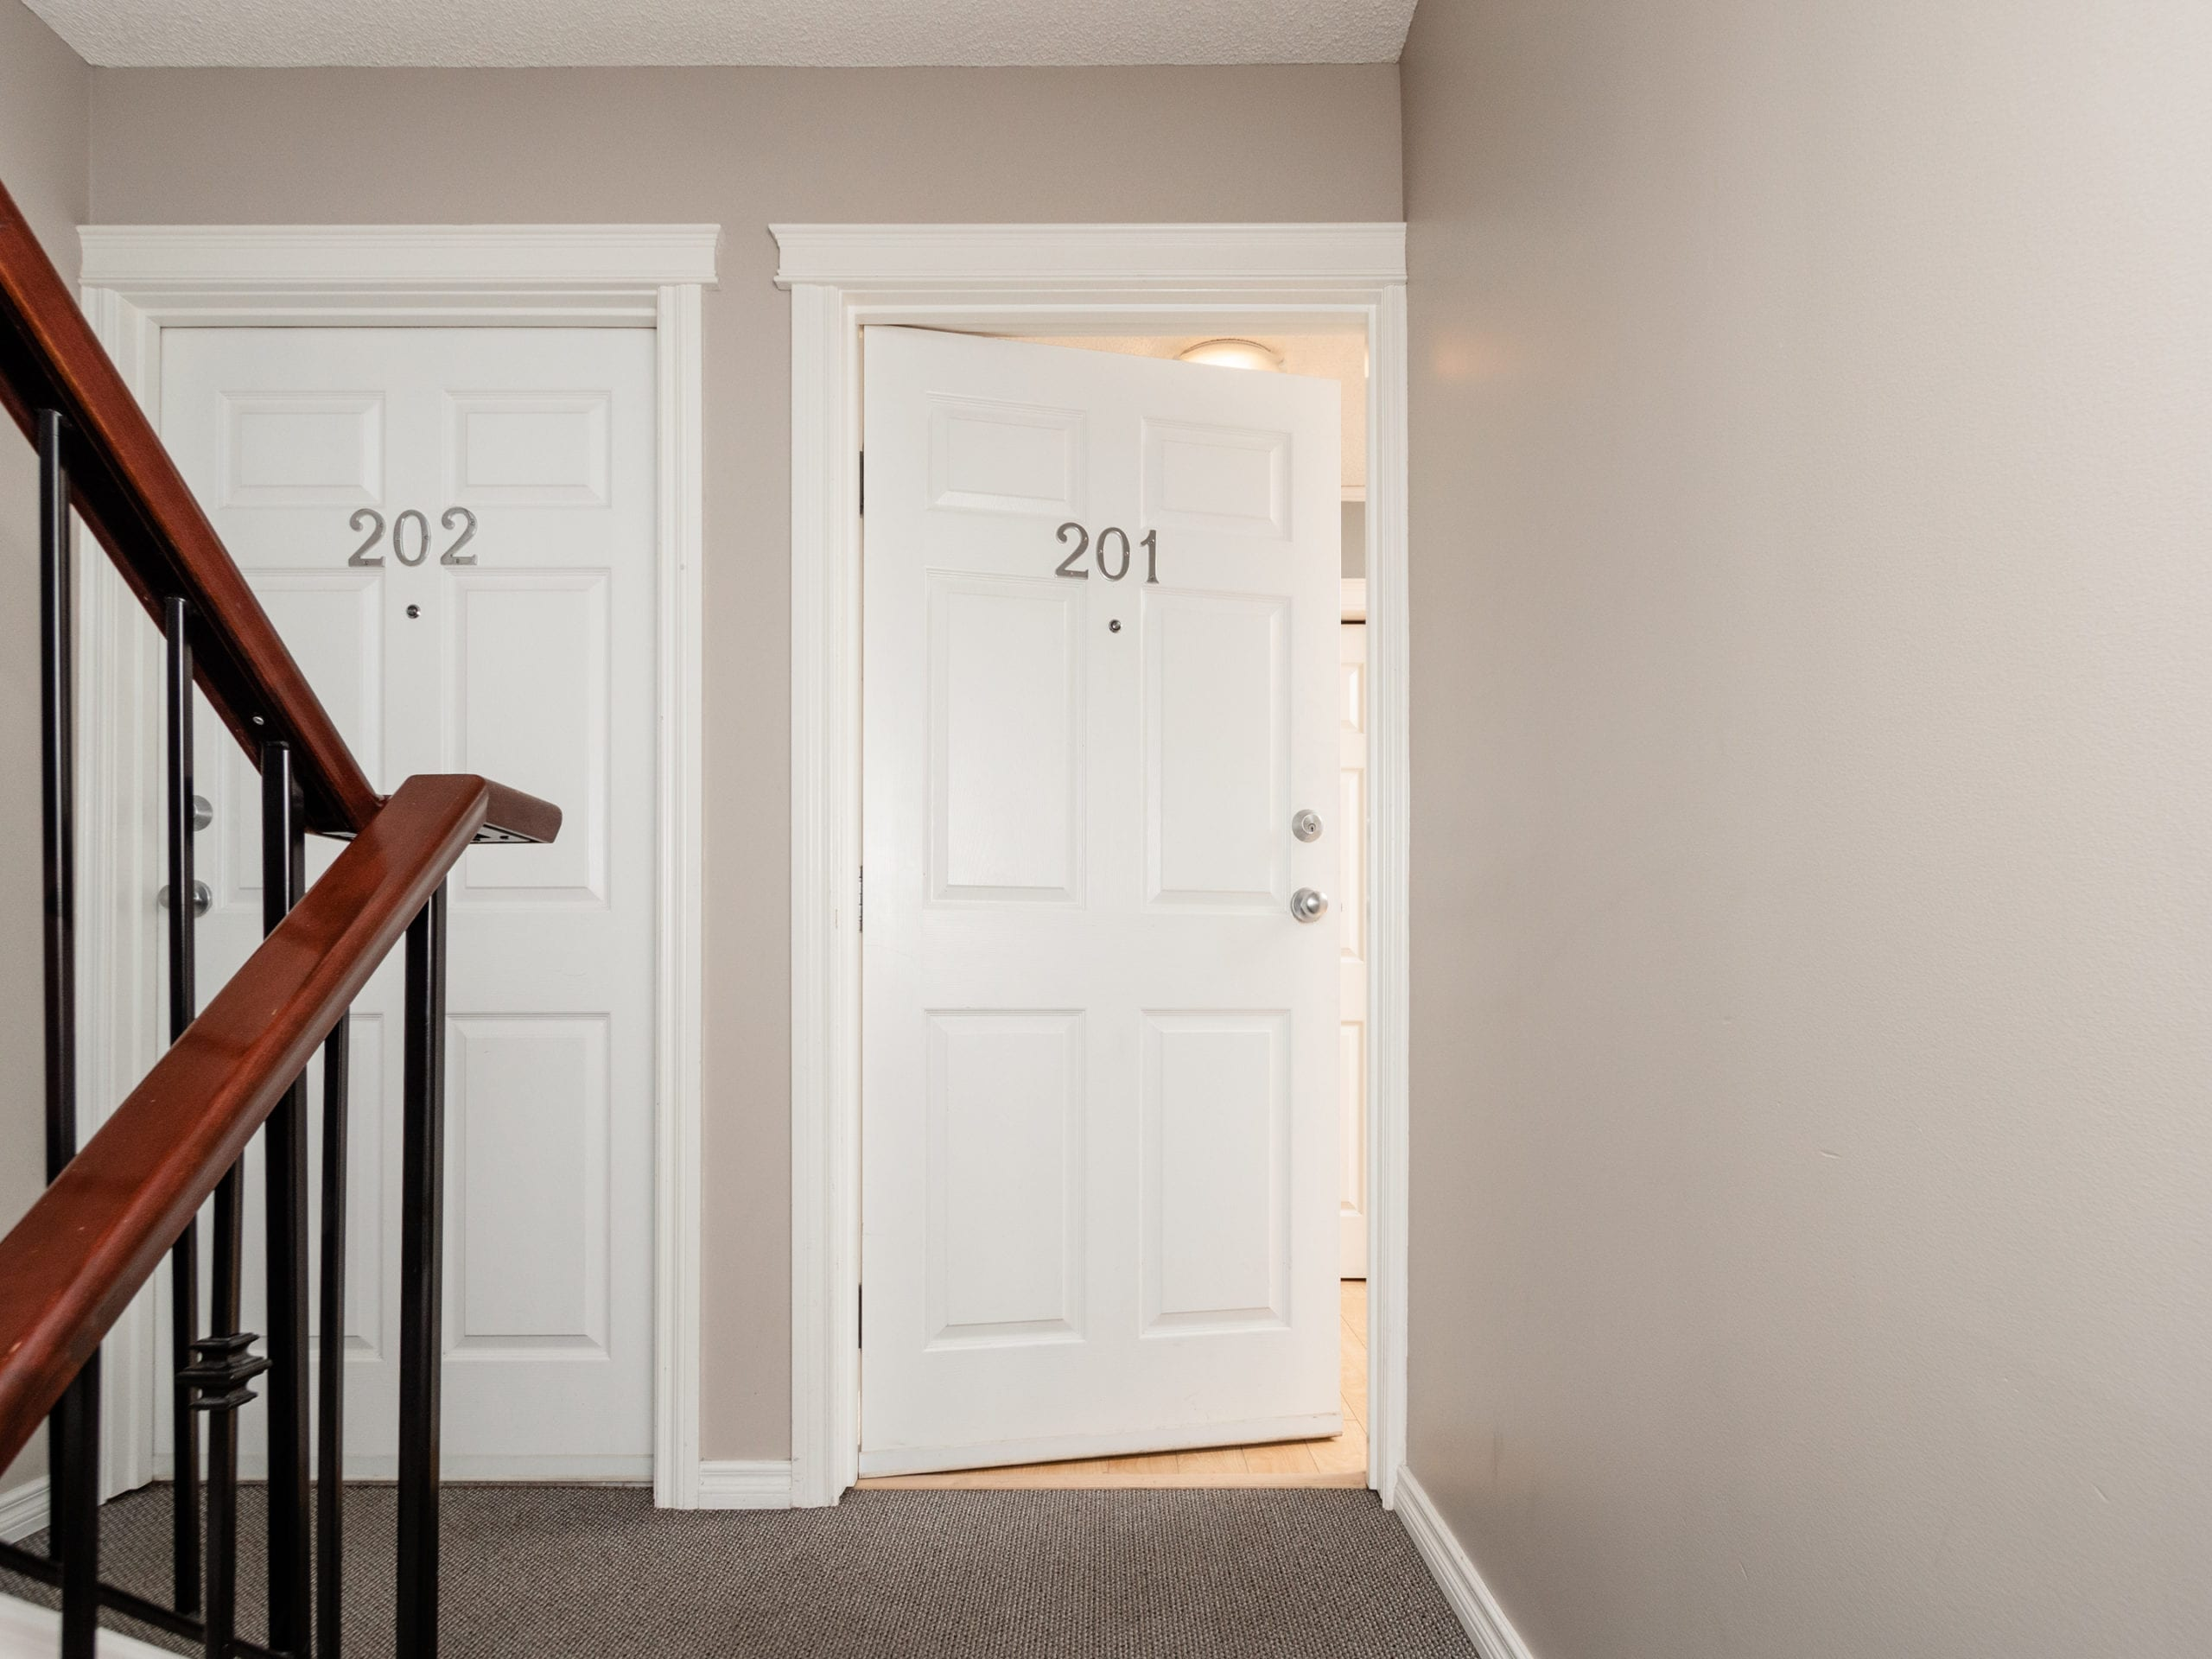 Hello Gorgeous - 201-339 30 Ave NE, Calgary AB - Tara Molina Real Estate (2 of 29)